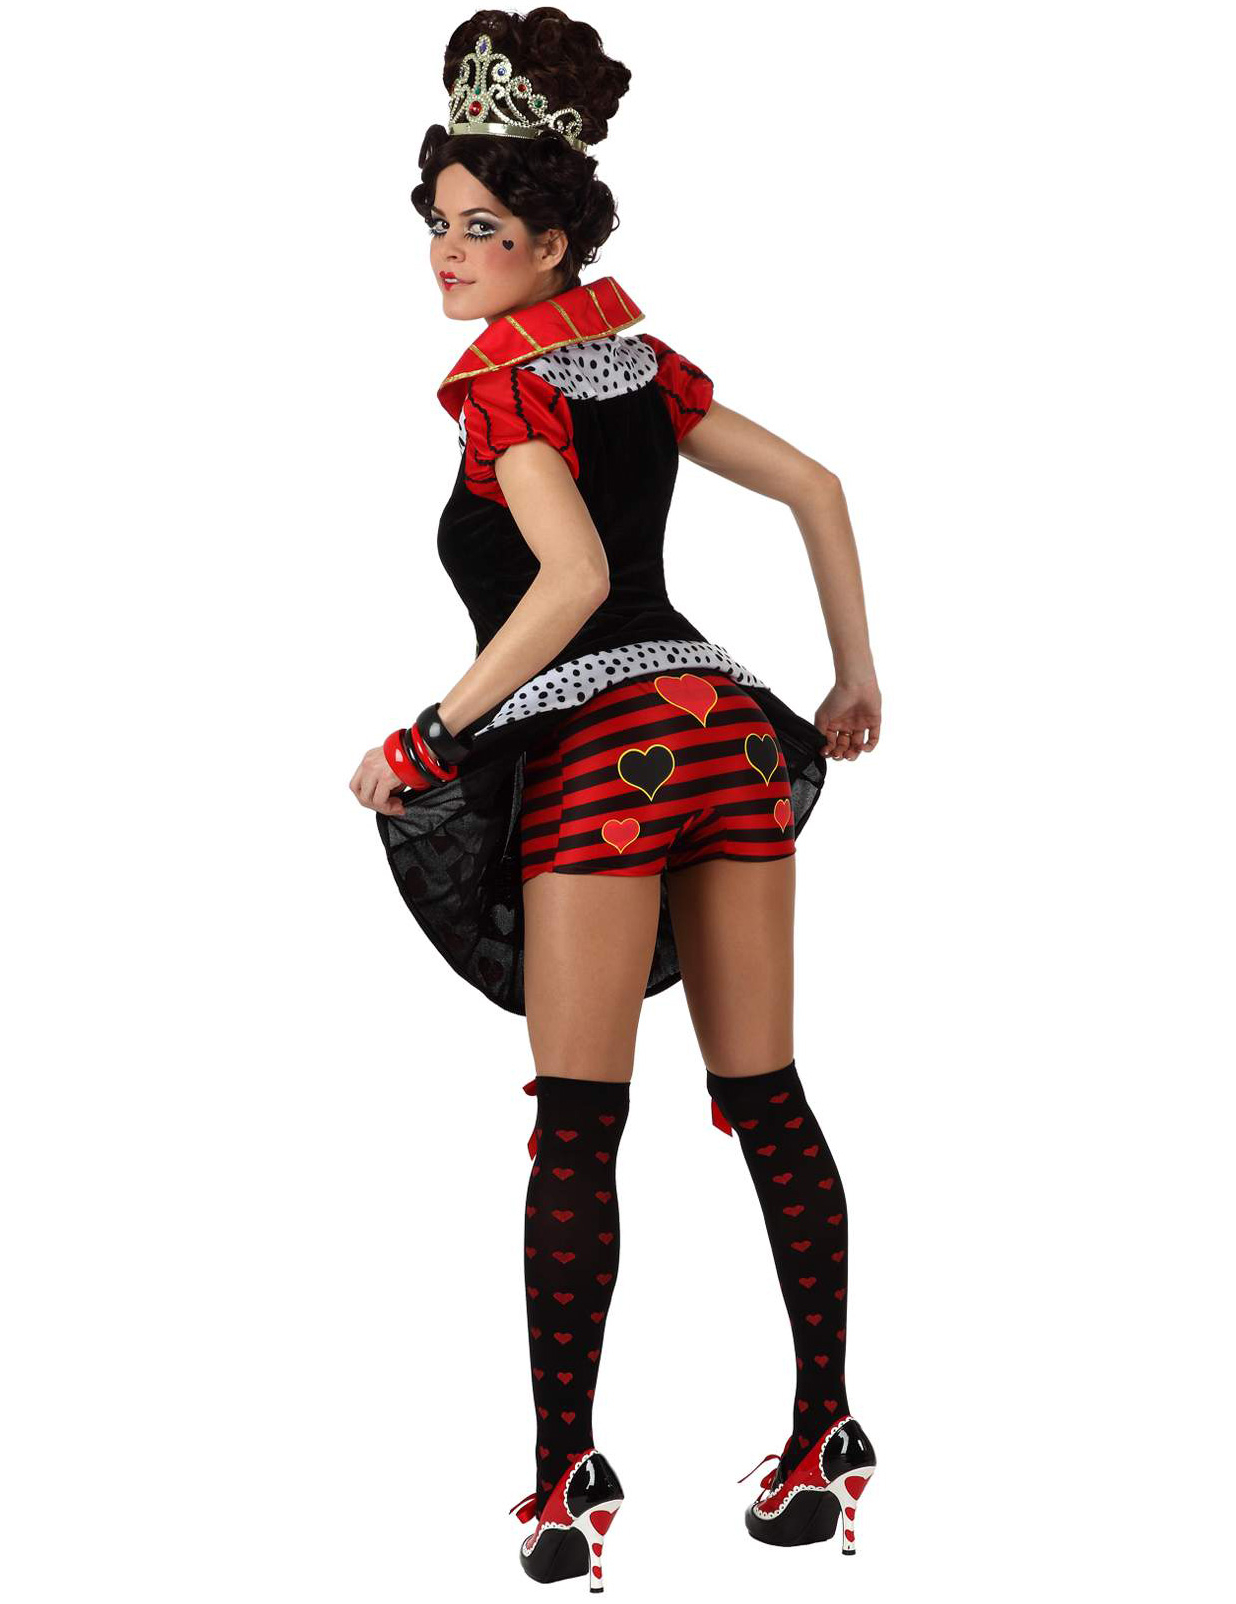 Deguisement-reine-de-coeur-femme-Cod-204908